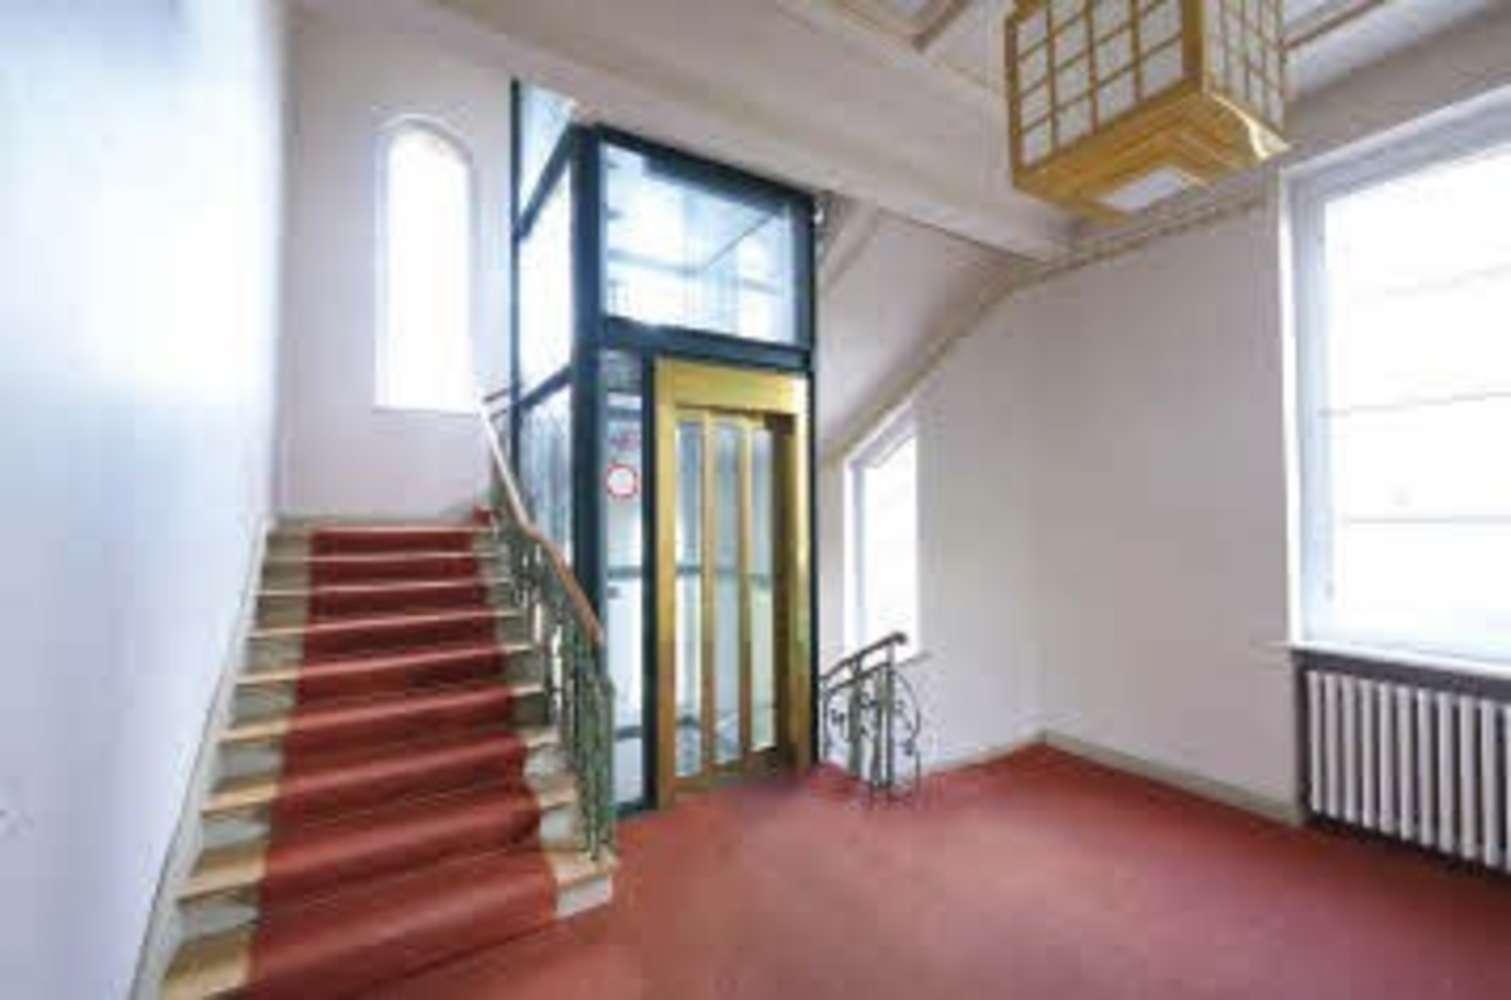 Büros Berlin, 13407 - Büro - Berlin, Reinickendorf - B0145 - 9417570